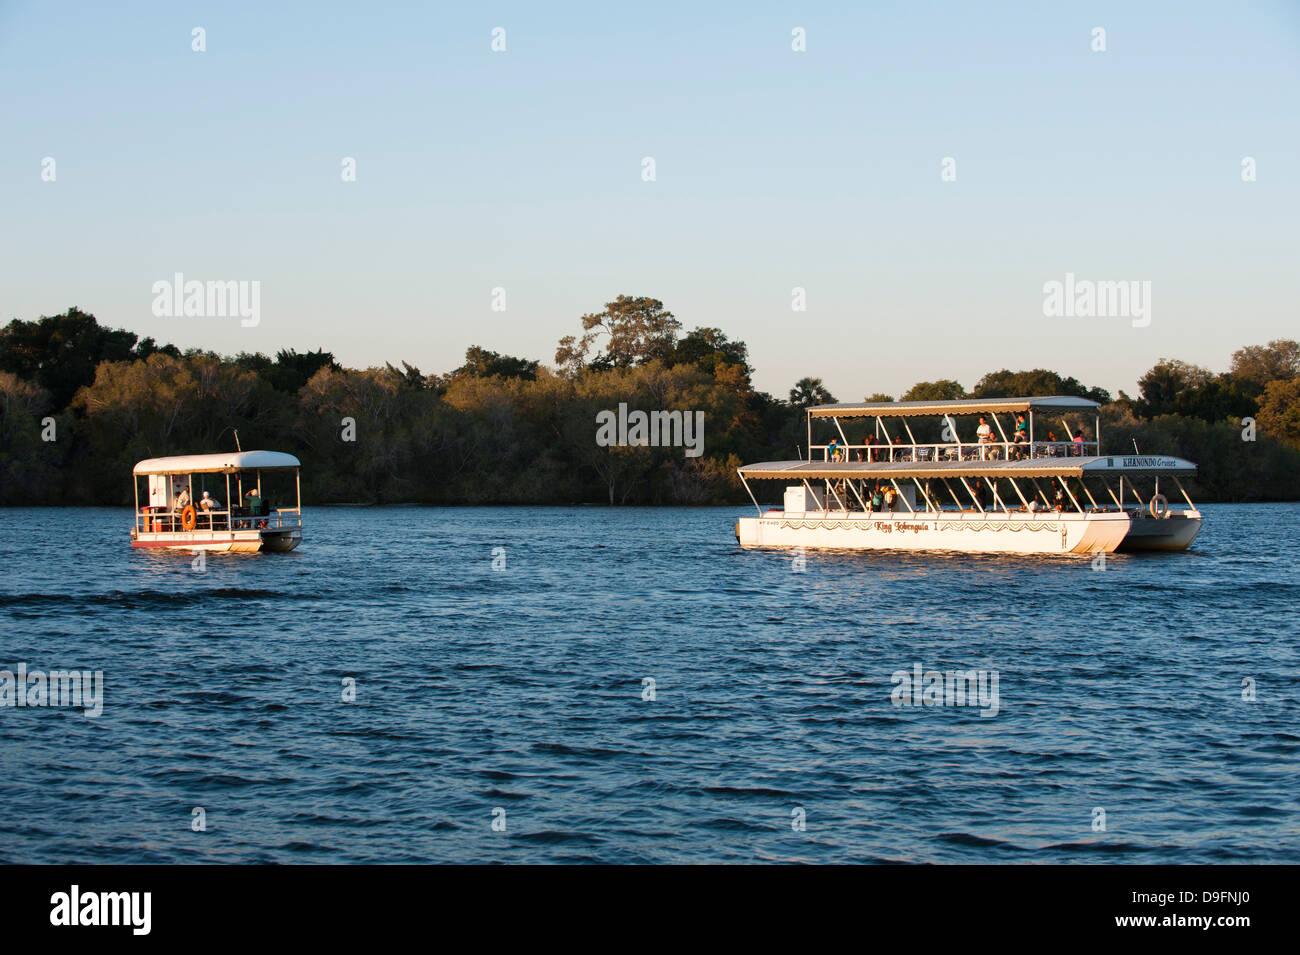 Tourist boat, Chobe River, Chobe National Park, Botswana, Africa - Stock Image